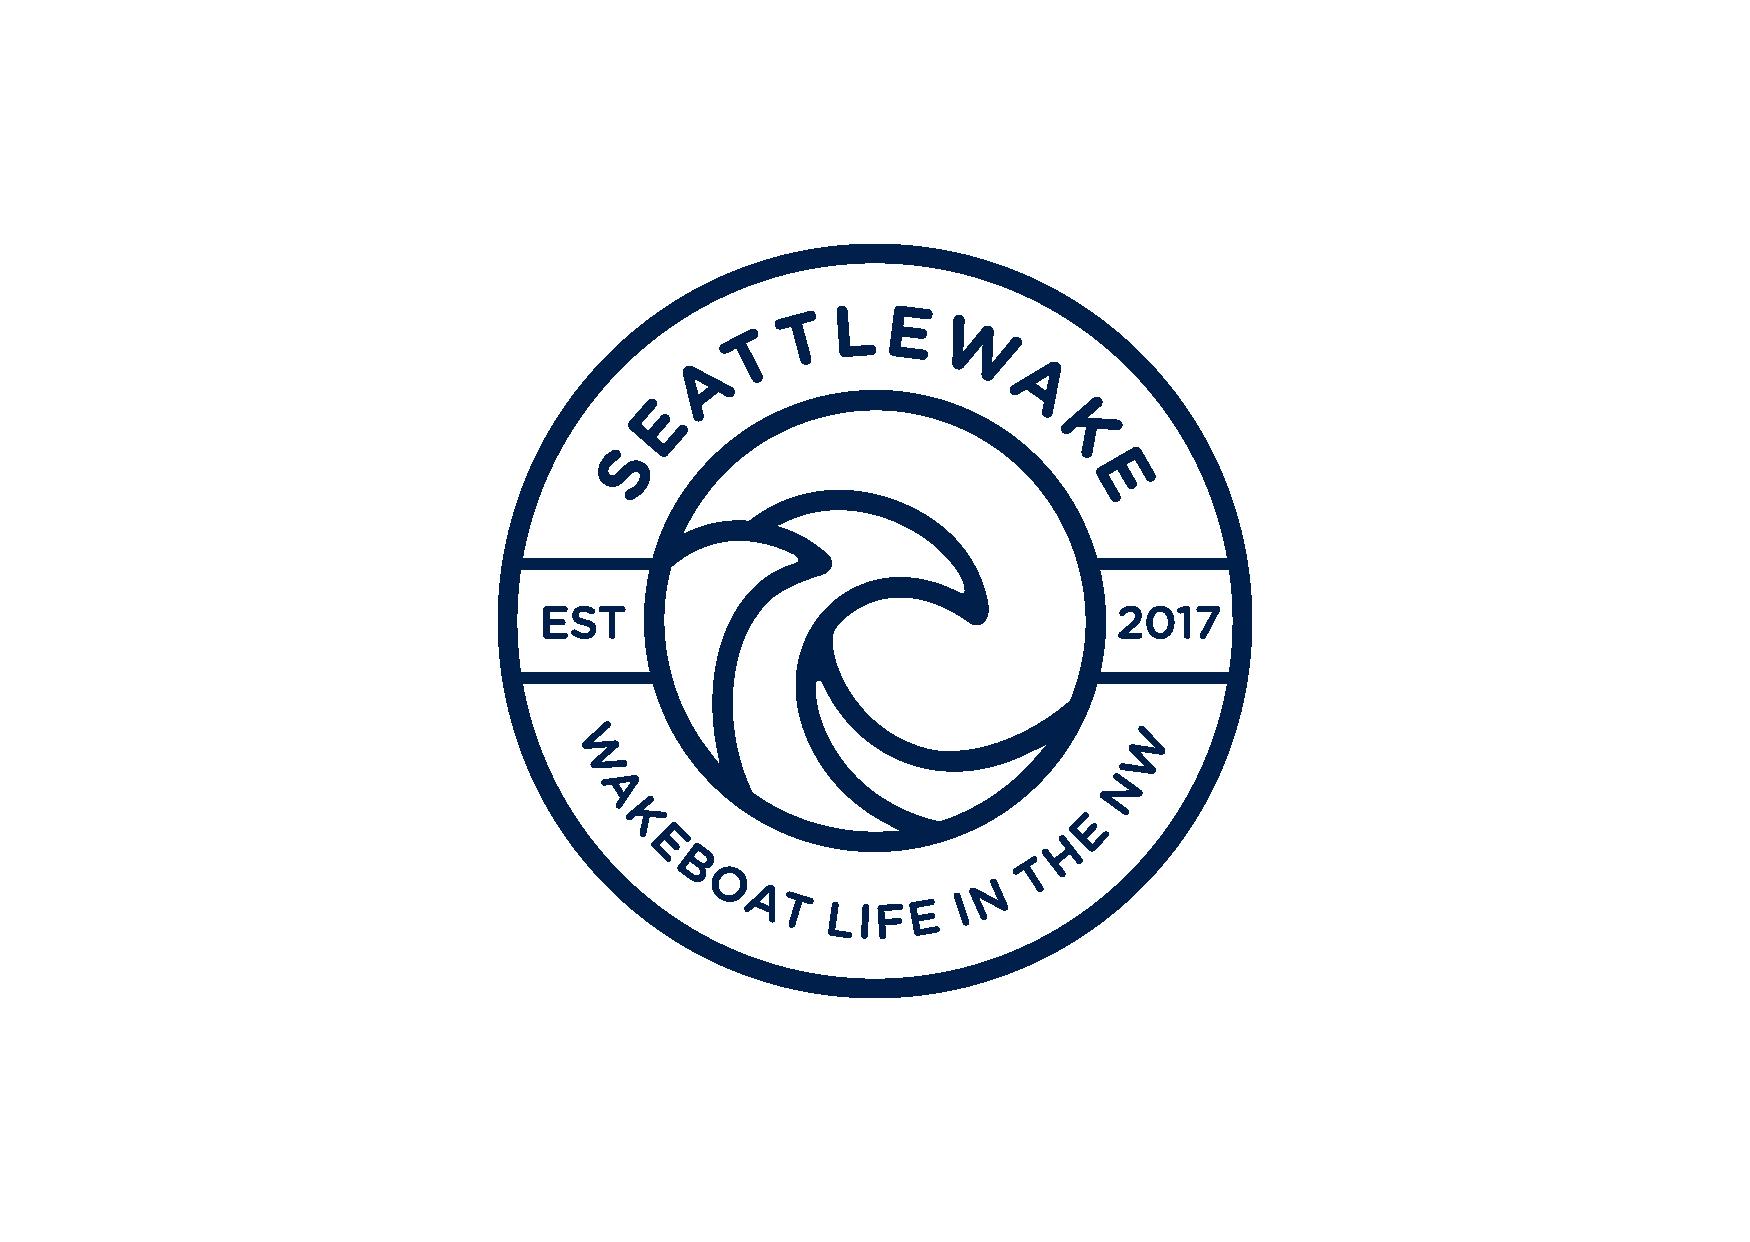 NEW logo for seattlewake -  wakesurfing logo